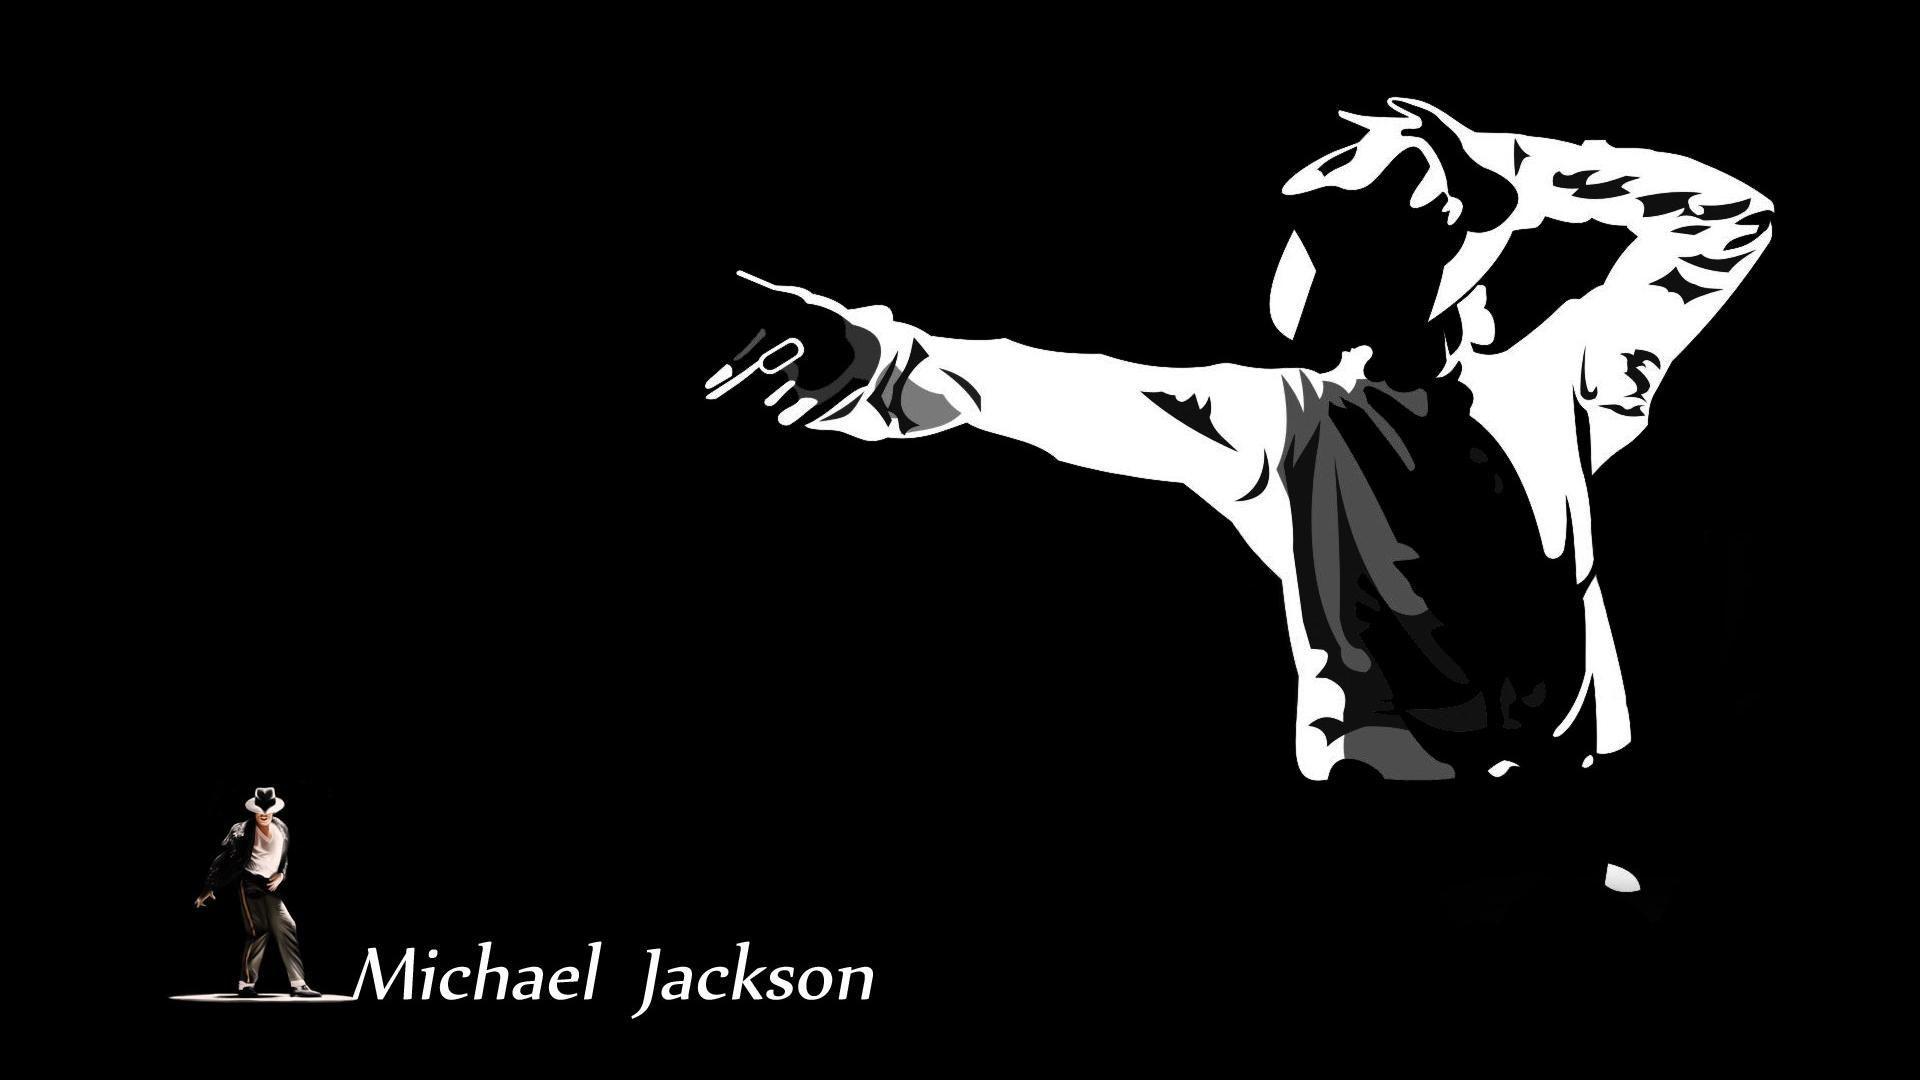 Cartoon Michael Jackson Wallpapers Top Free Cartoon Michael